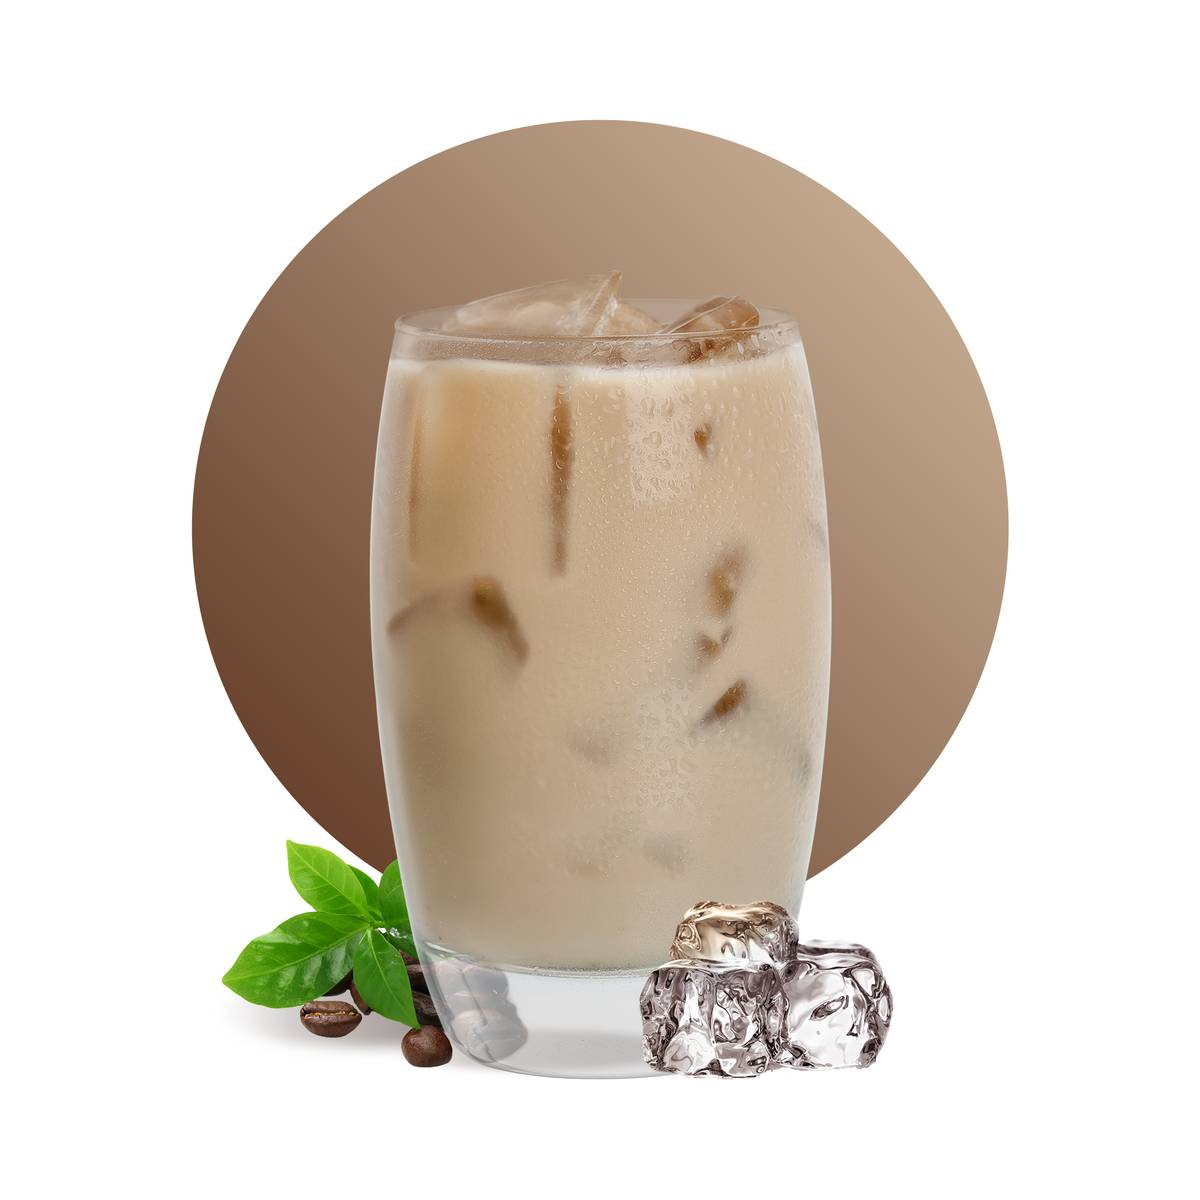 Creamy Iced Coffee Drink Recipe